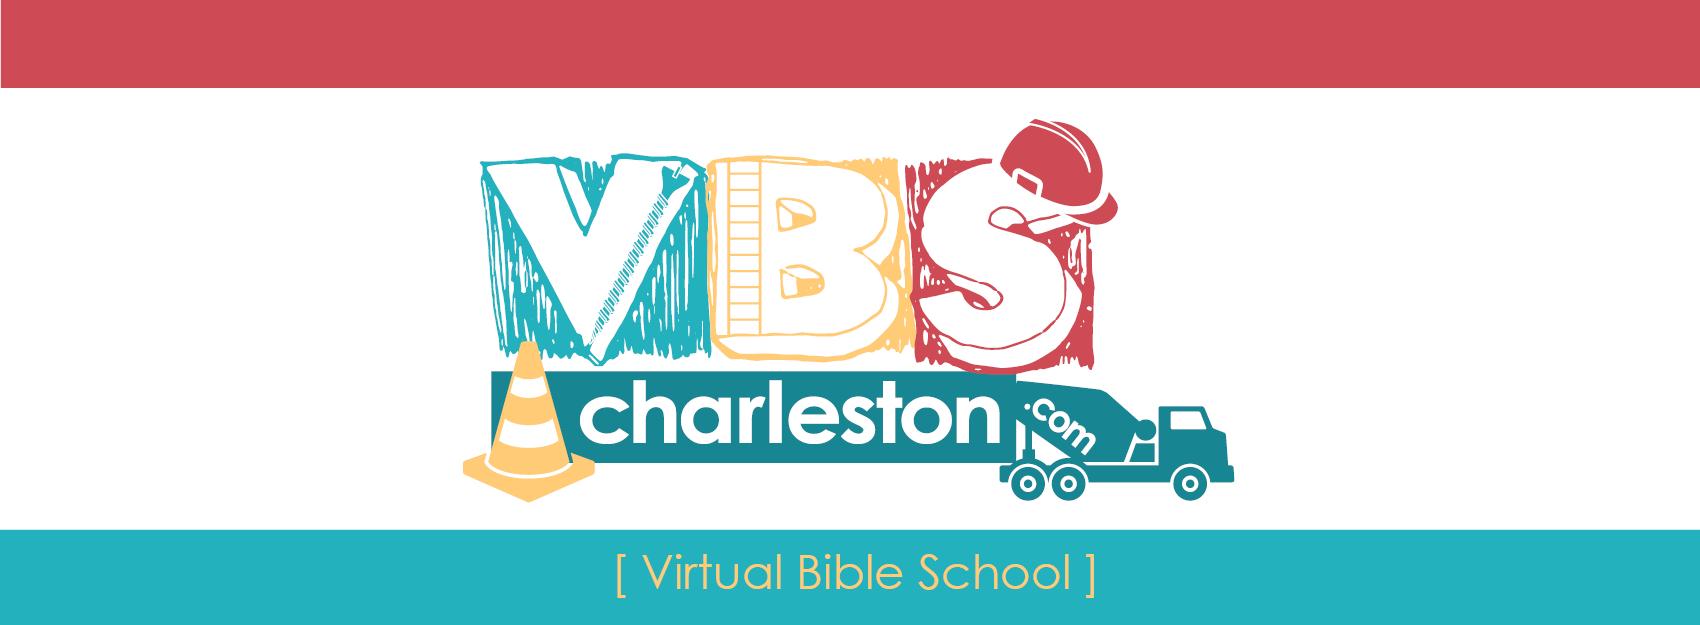 VBS CHARLESTON WEB SLIDER